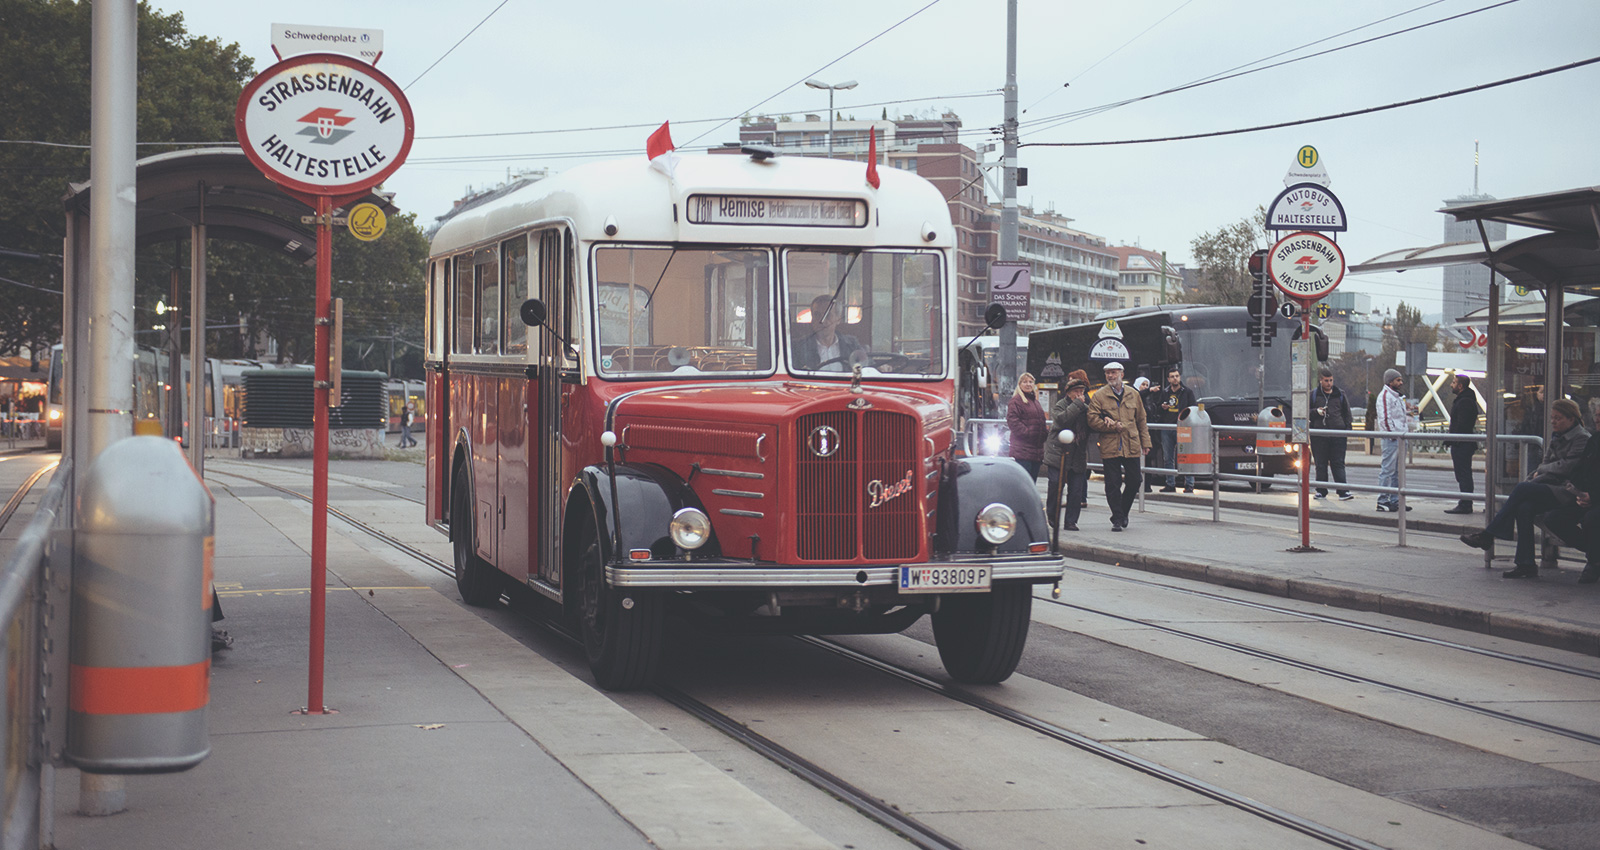 Wien_Budapest_Travel_133